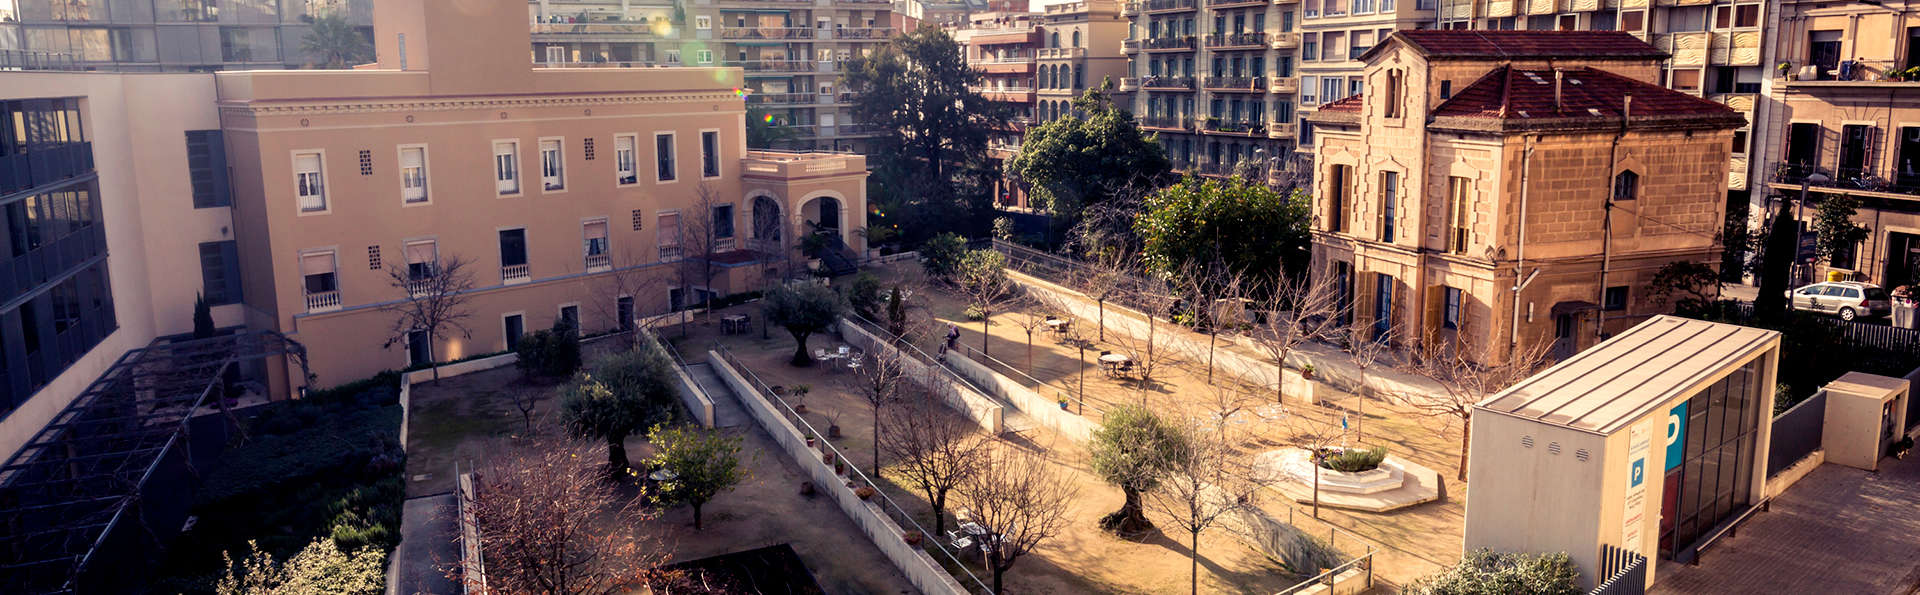 Descubre Barcelona en un hotel con encanto en Gràcia